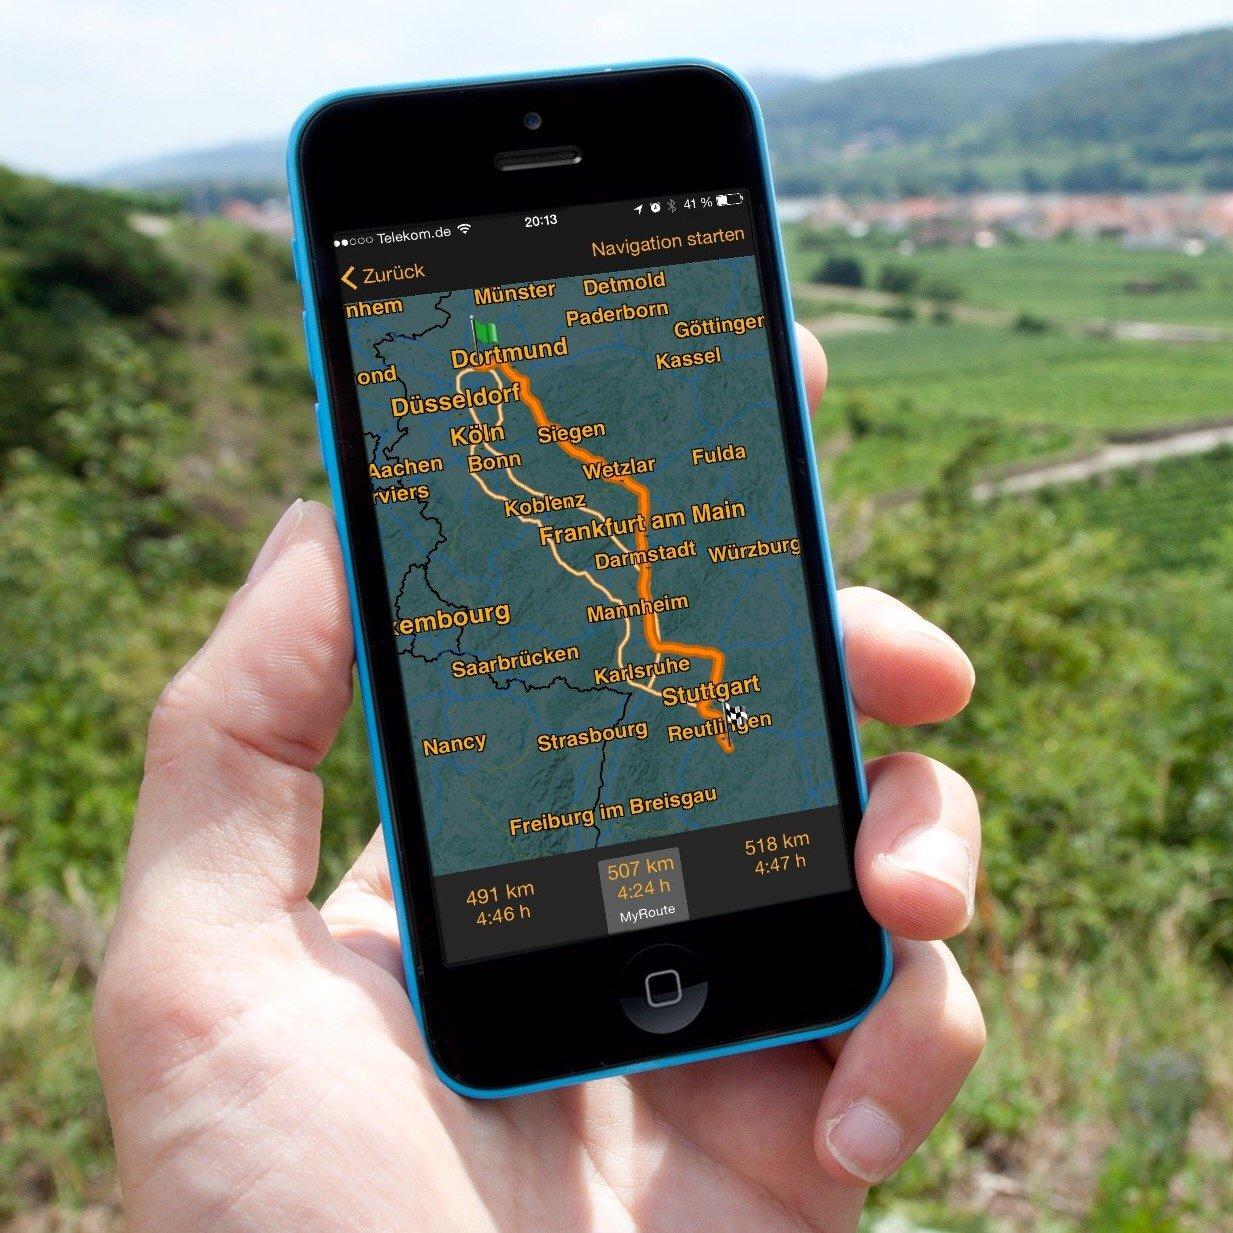 iPhone-Navigation-Route-Google-Maps-Karten-NAVIGON-4.jpg